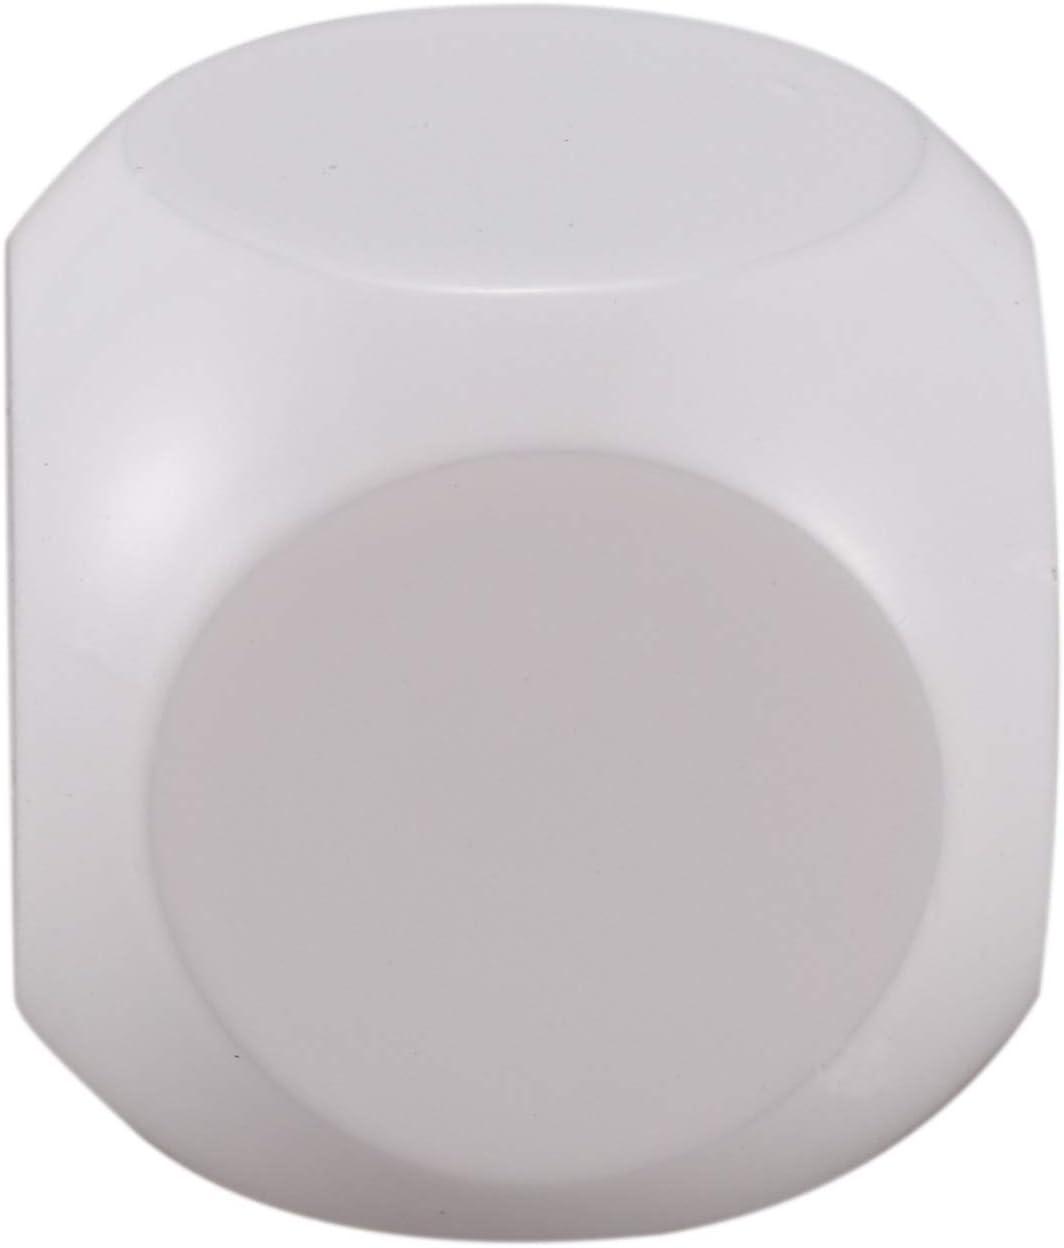 Luntus G1//4 Inner Thread Brass 3-Way Splitter Ball Fitting for Water Cooling Tube Fittings Blk White